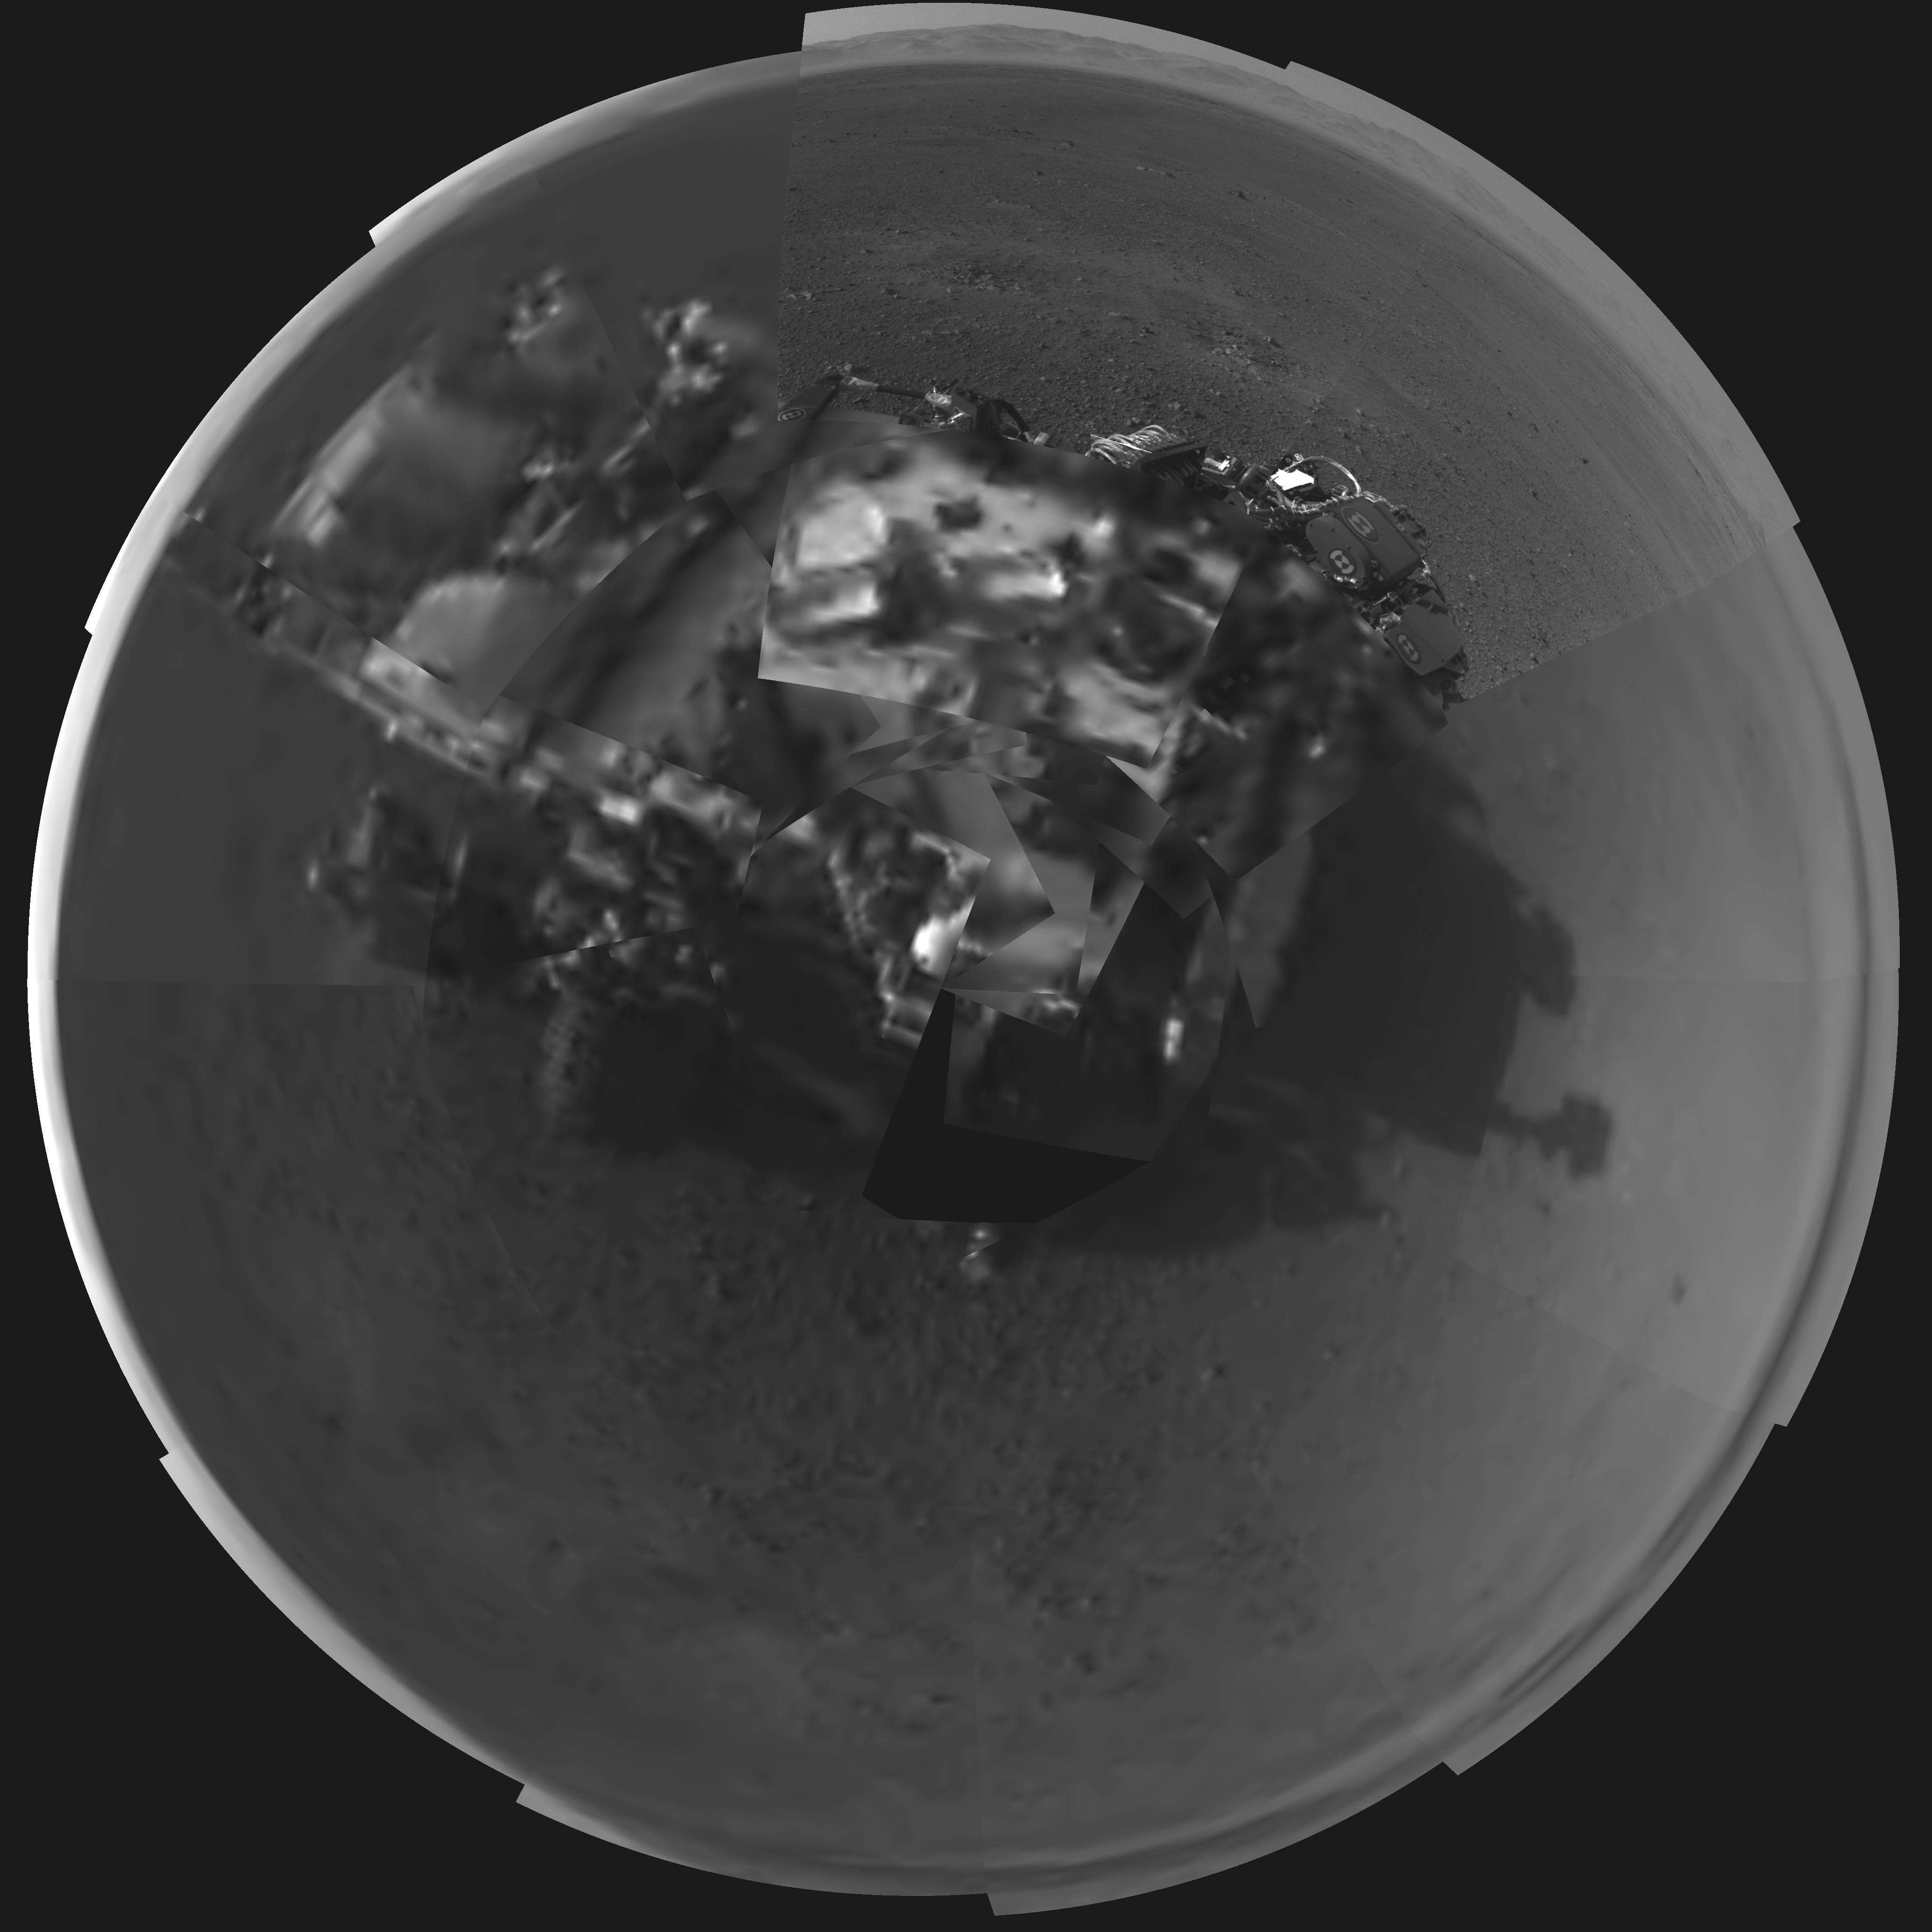 mars rover self portrait